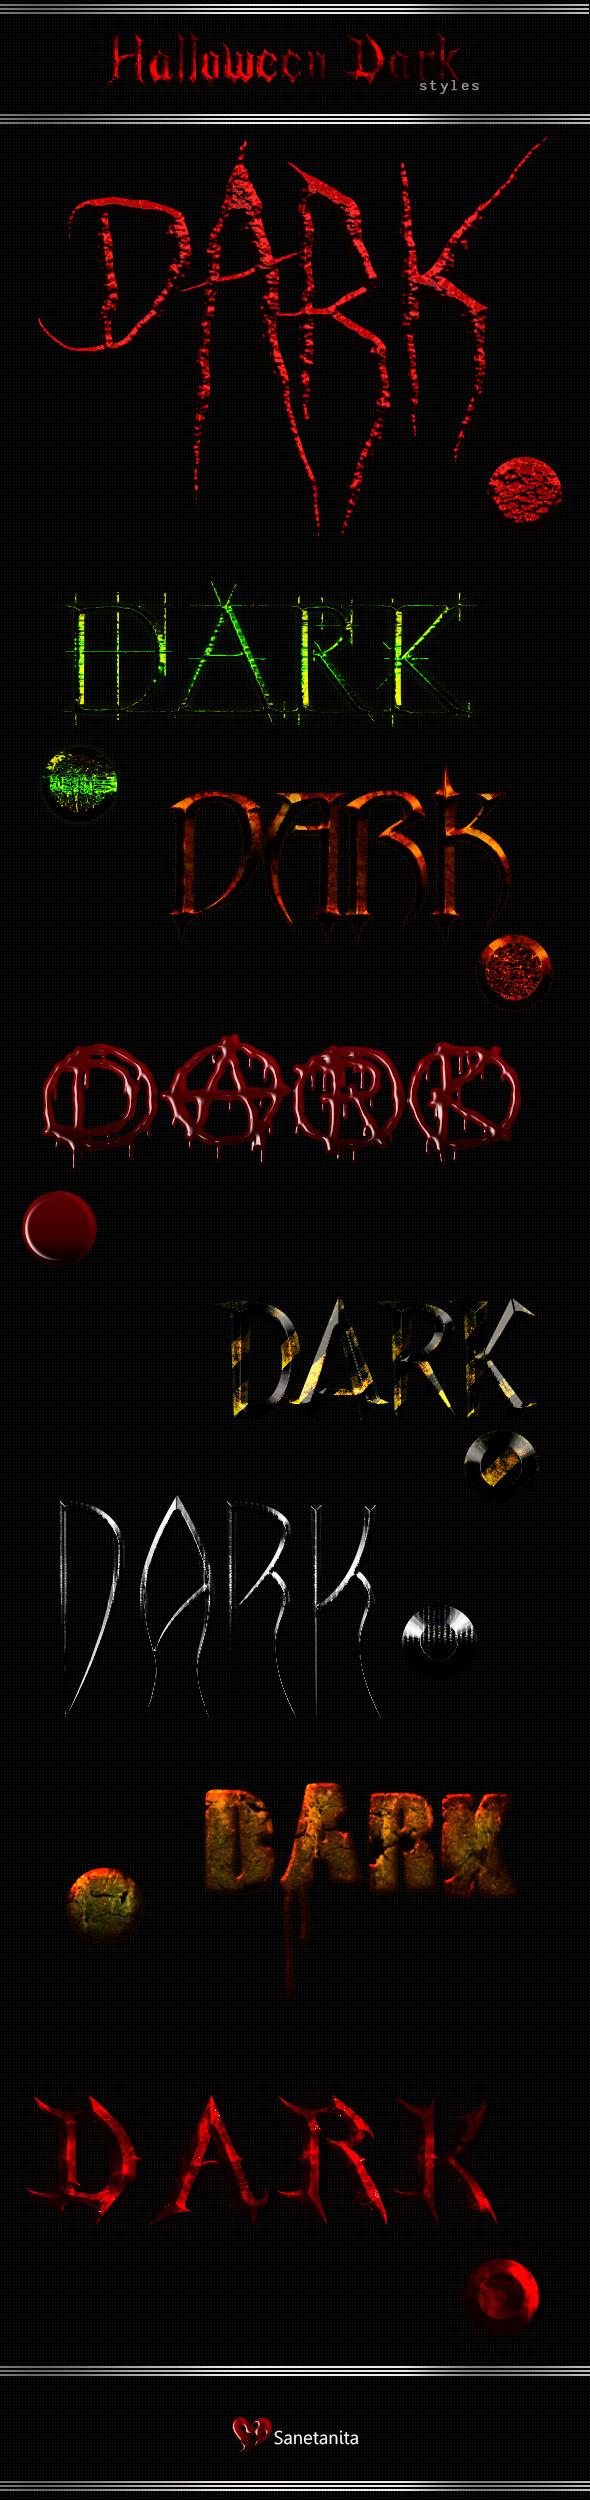 Halloween Dark Styles - Text Effects Styles